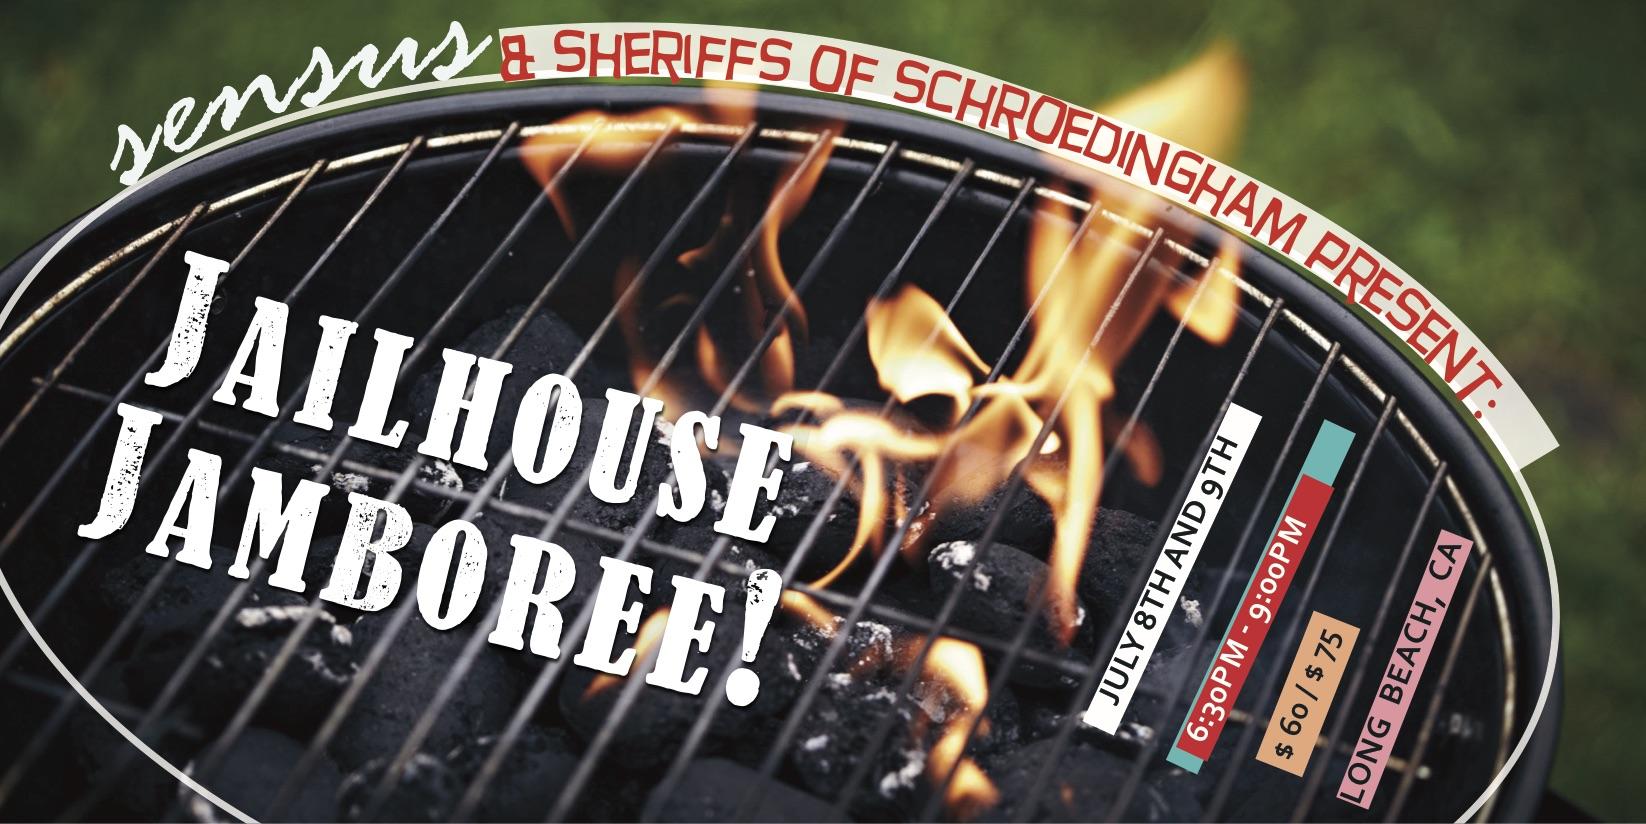 Jailhouse Jamboree Flier